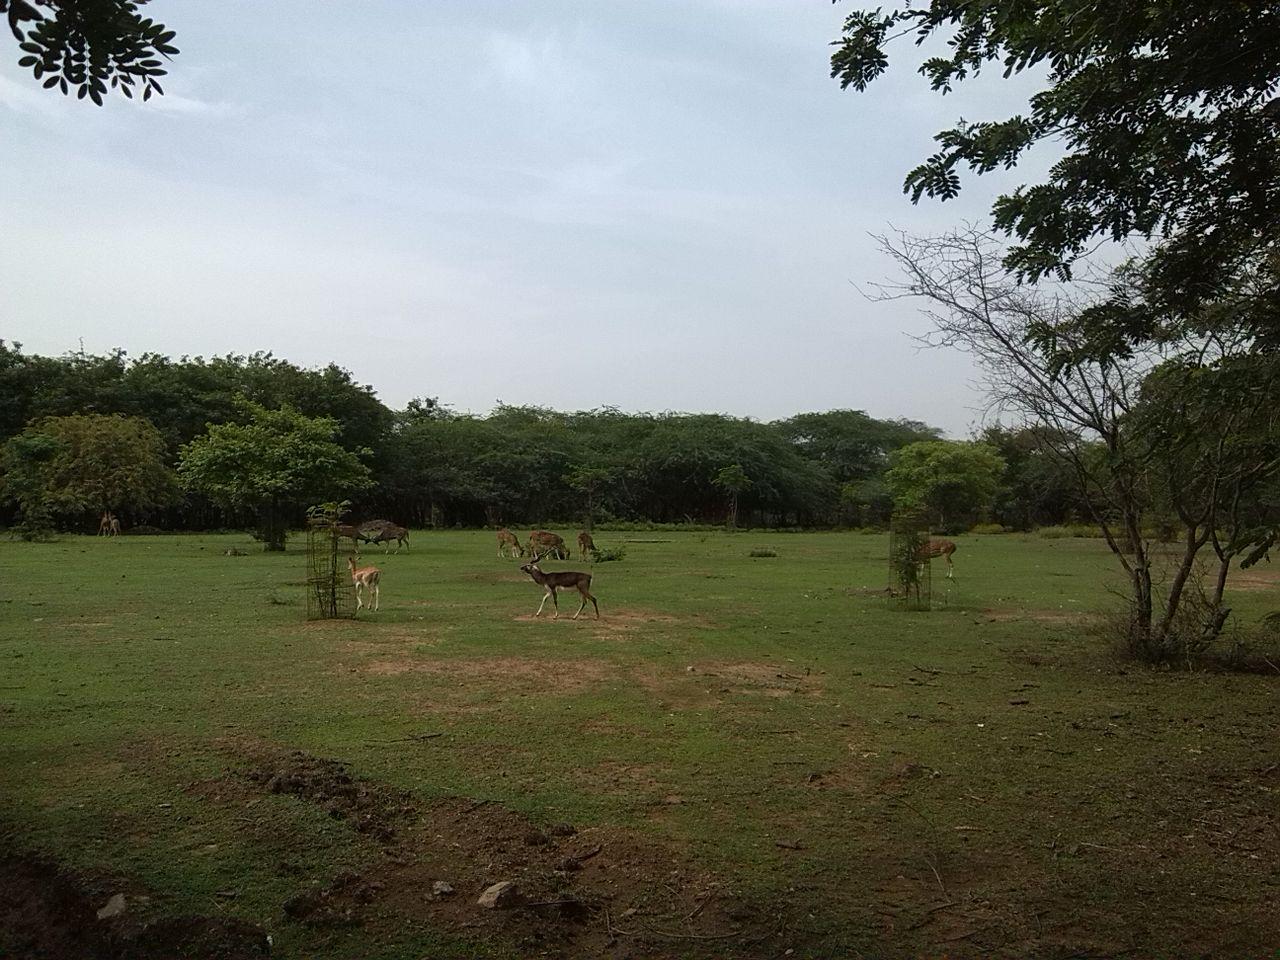 IIT Madras Wikipedia: File:Blackbuck Deer With Other Deers At Iitm.jpg